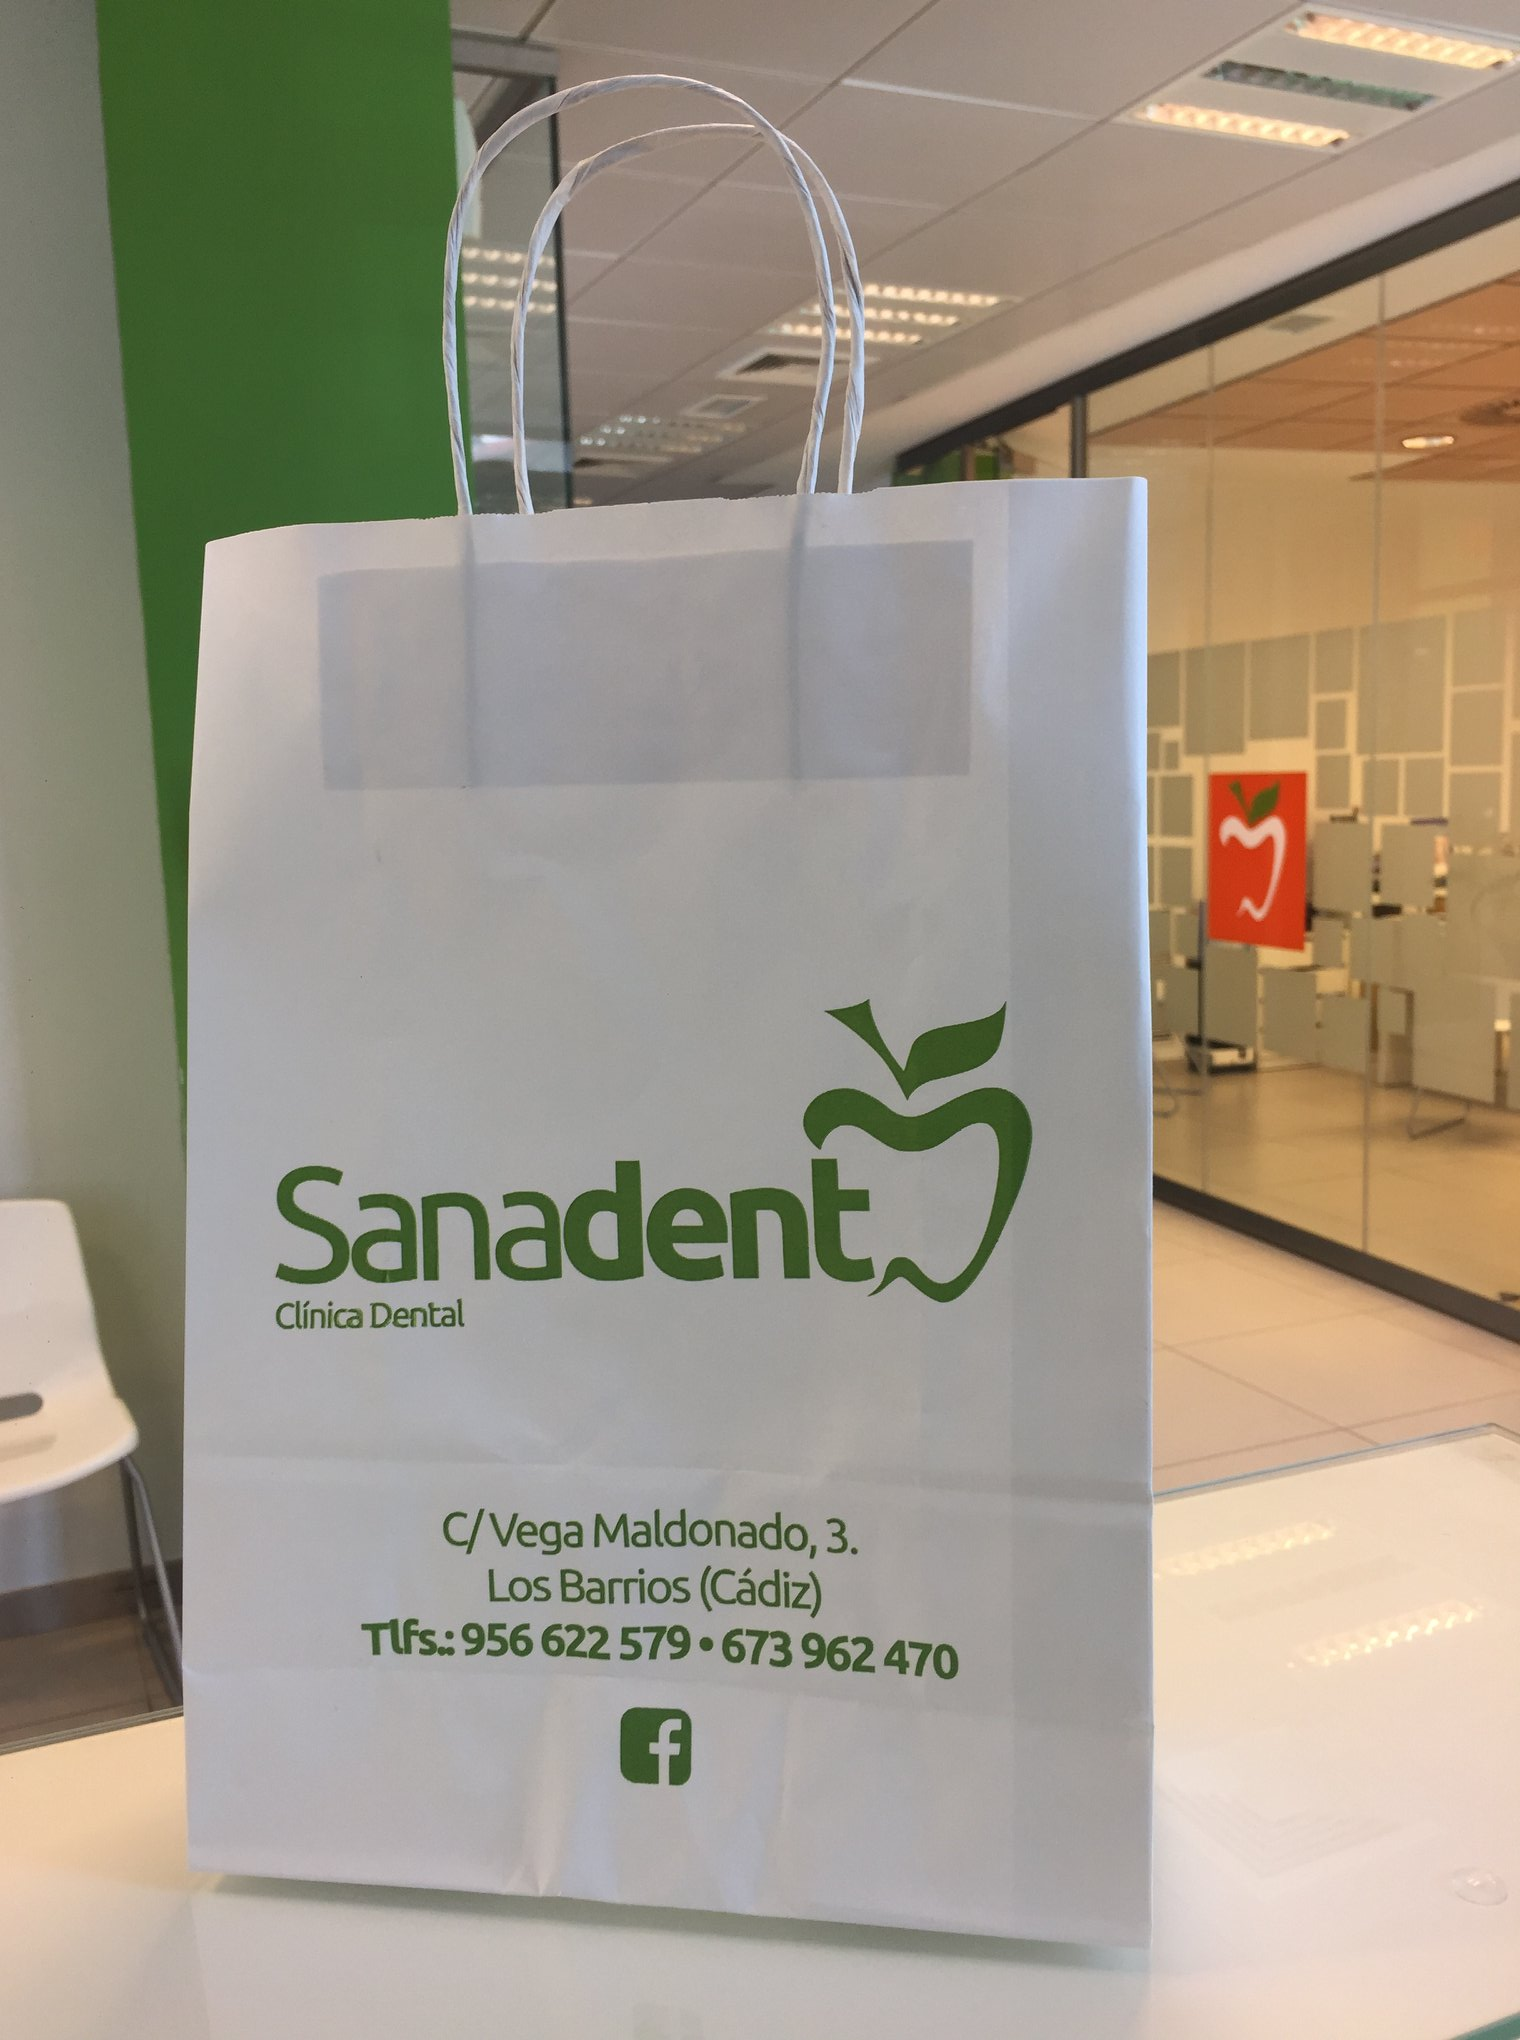 Sanadent